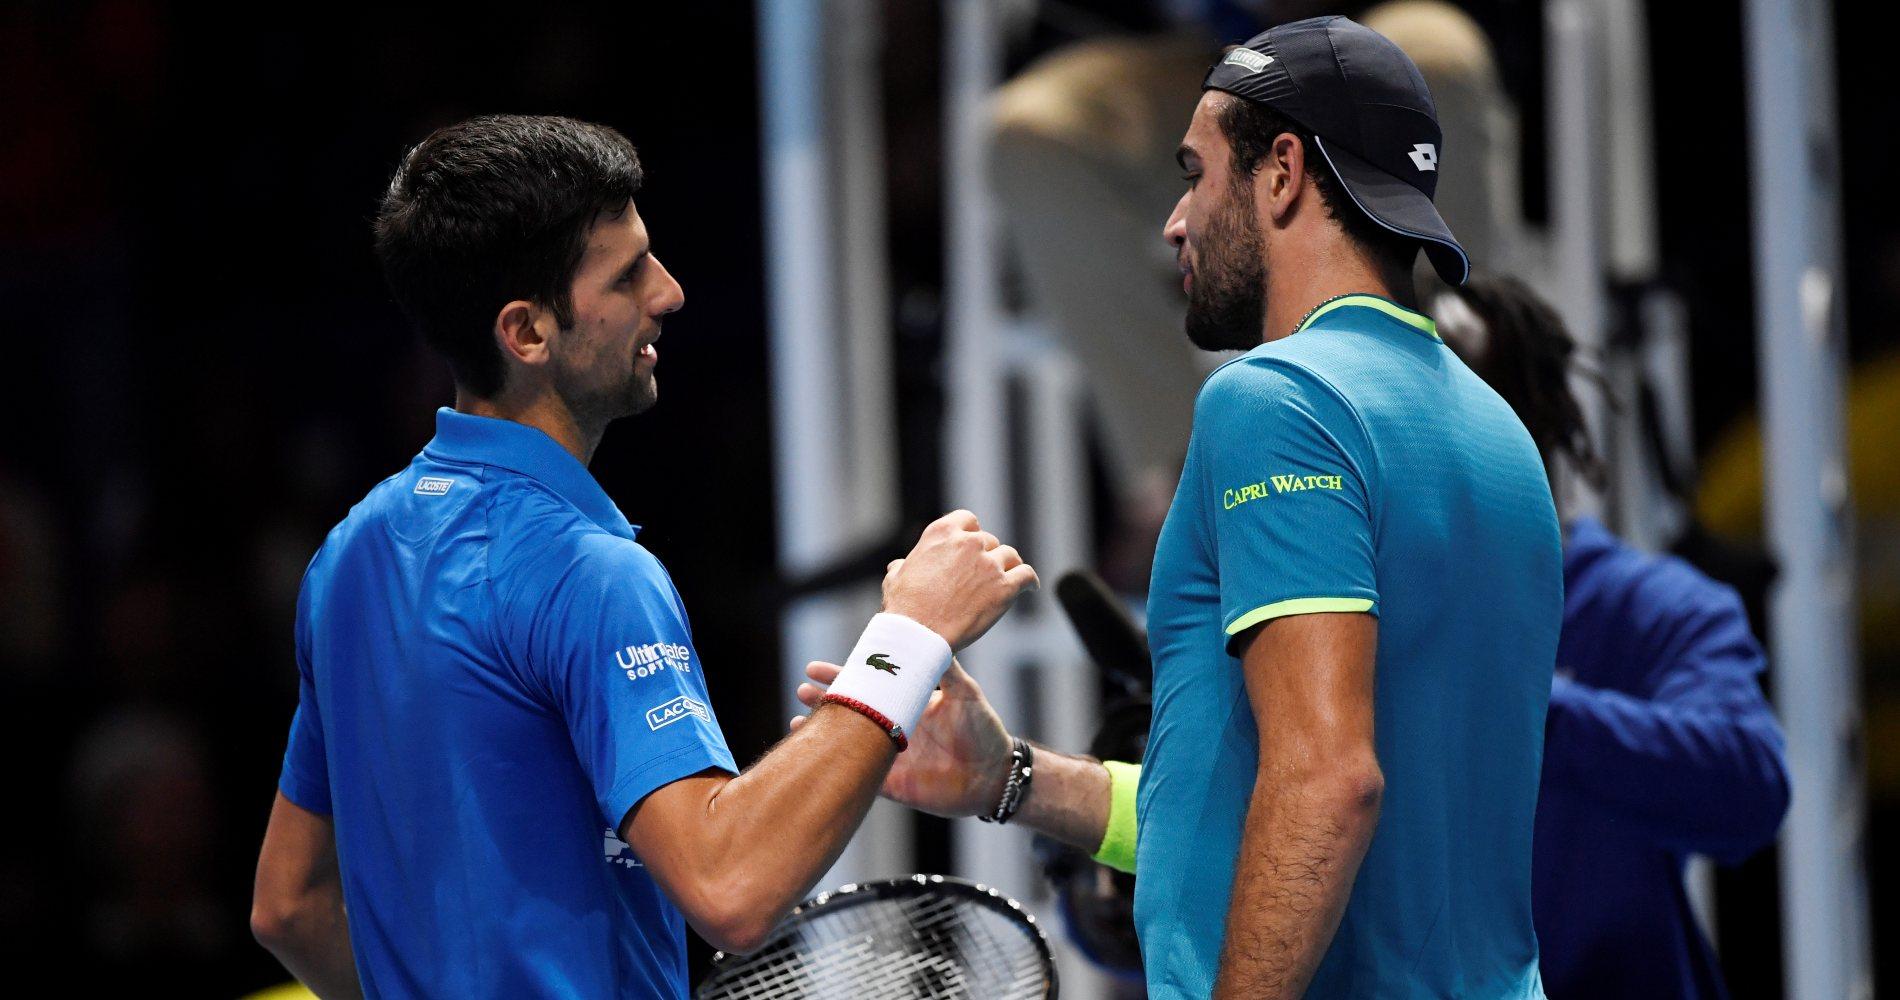 Novak Djokovic & Matteo Berrettini at ATP Finals in 2019